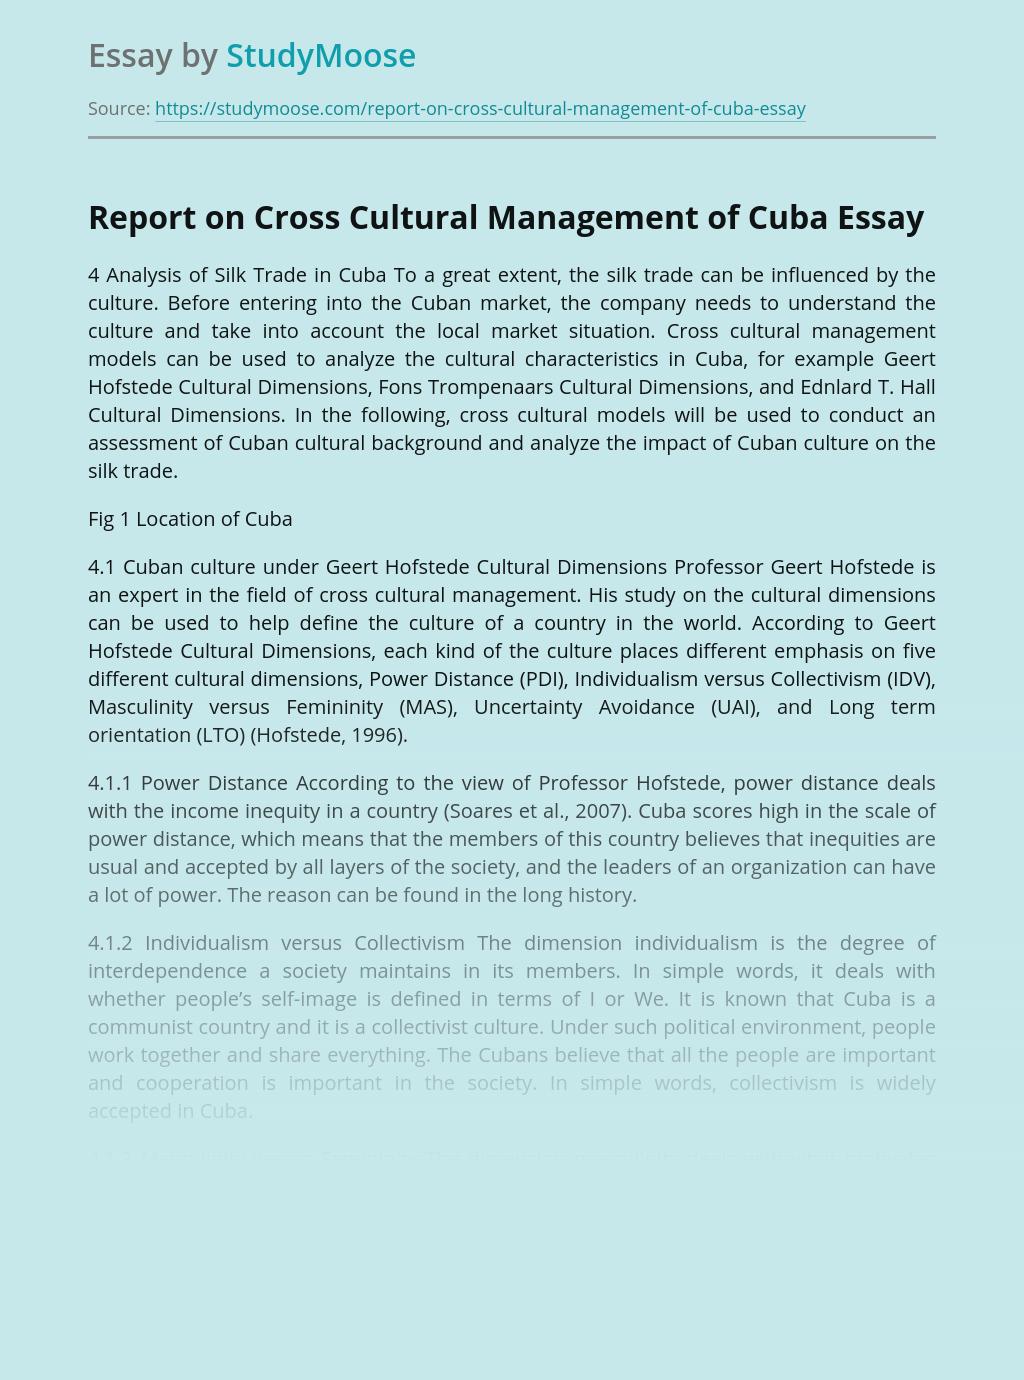 Report on Cross Cultural Management of Cuba